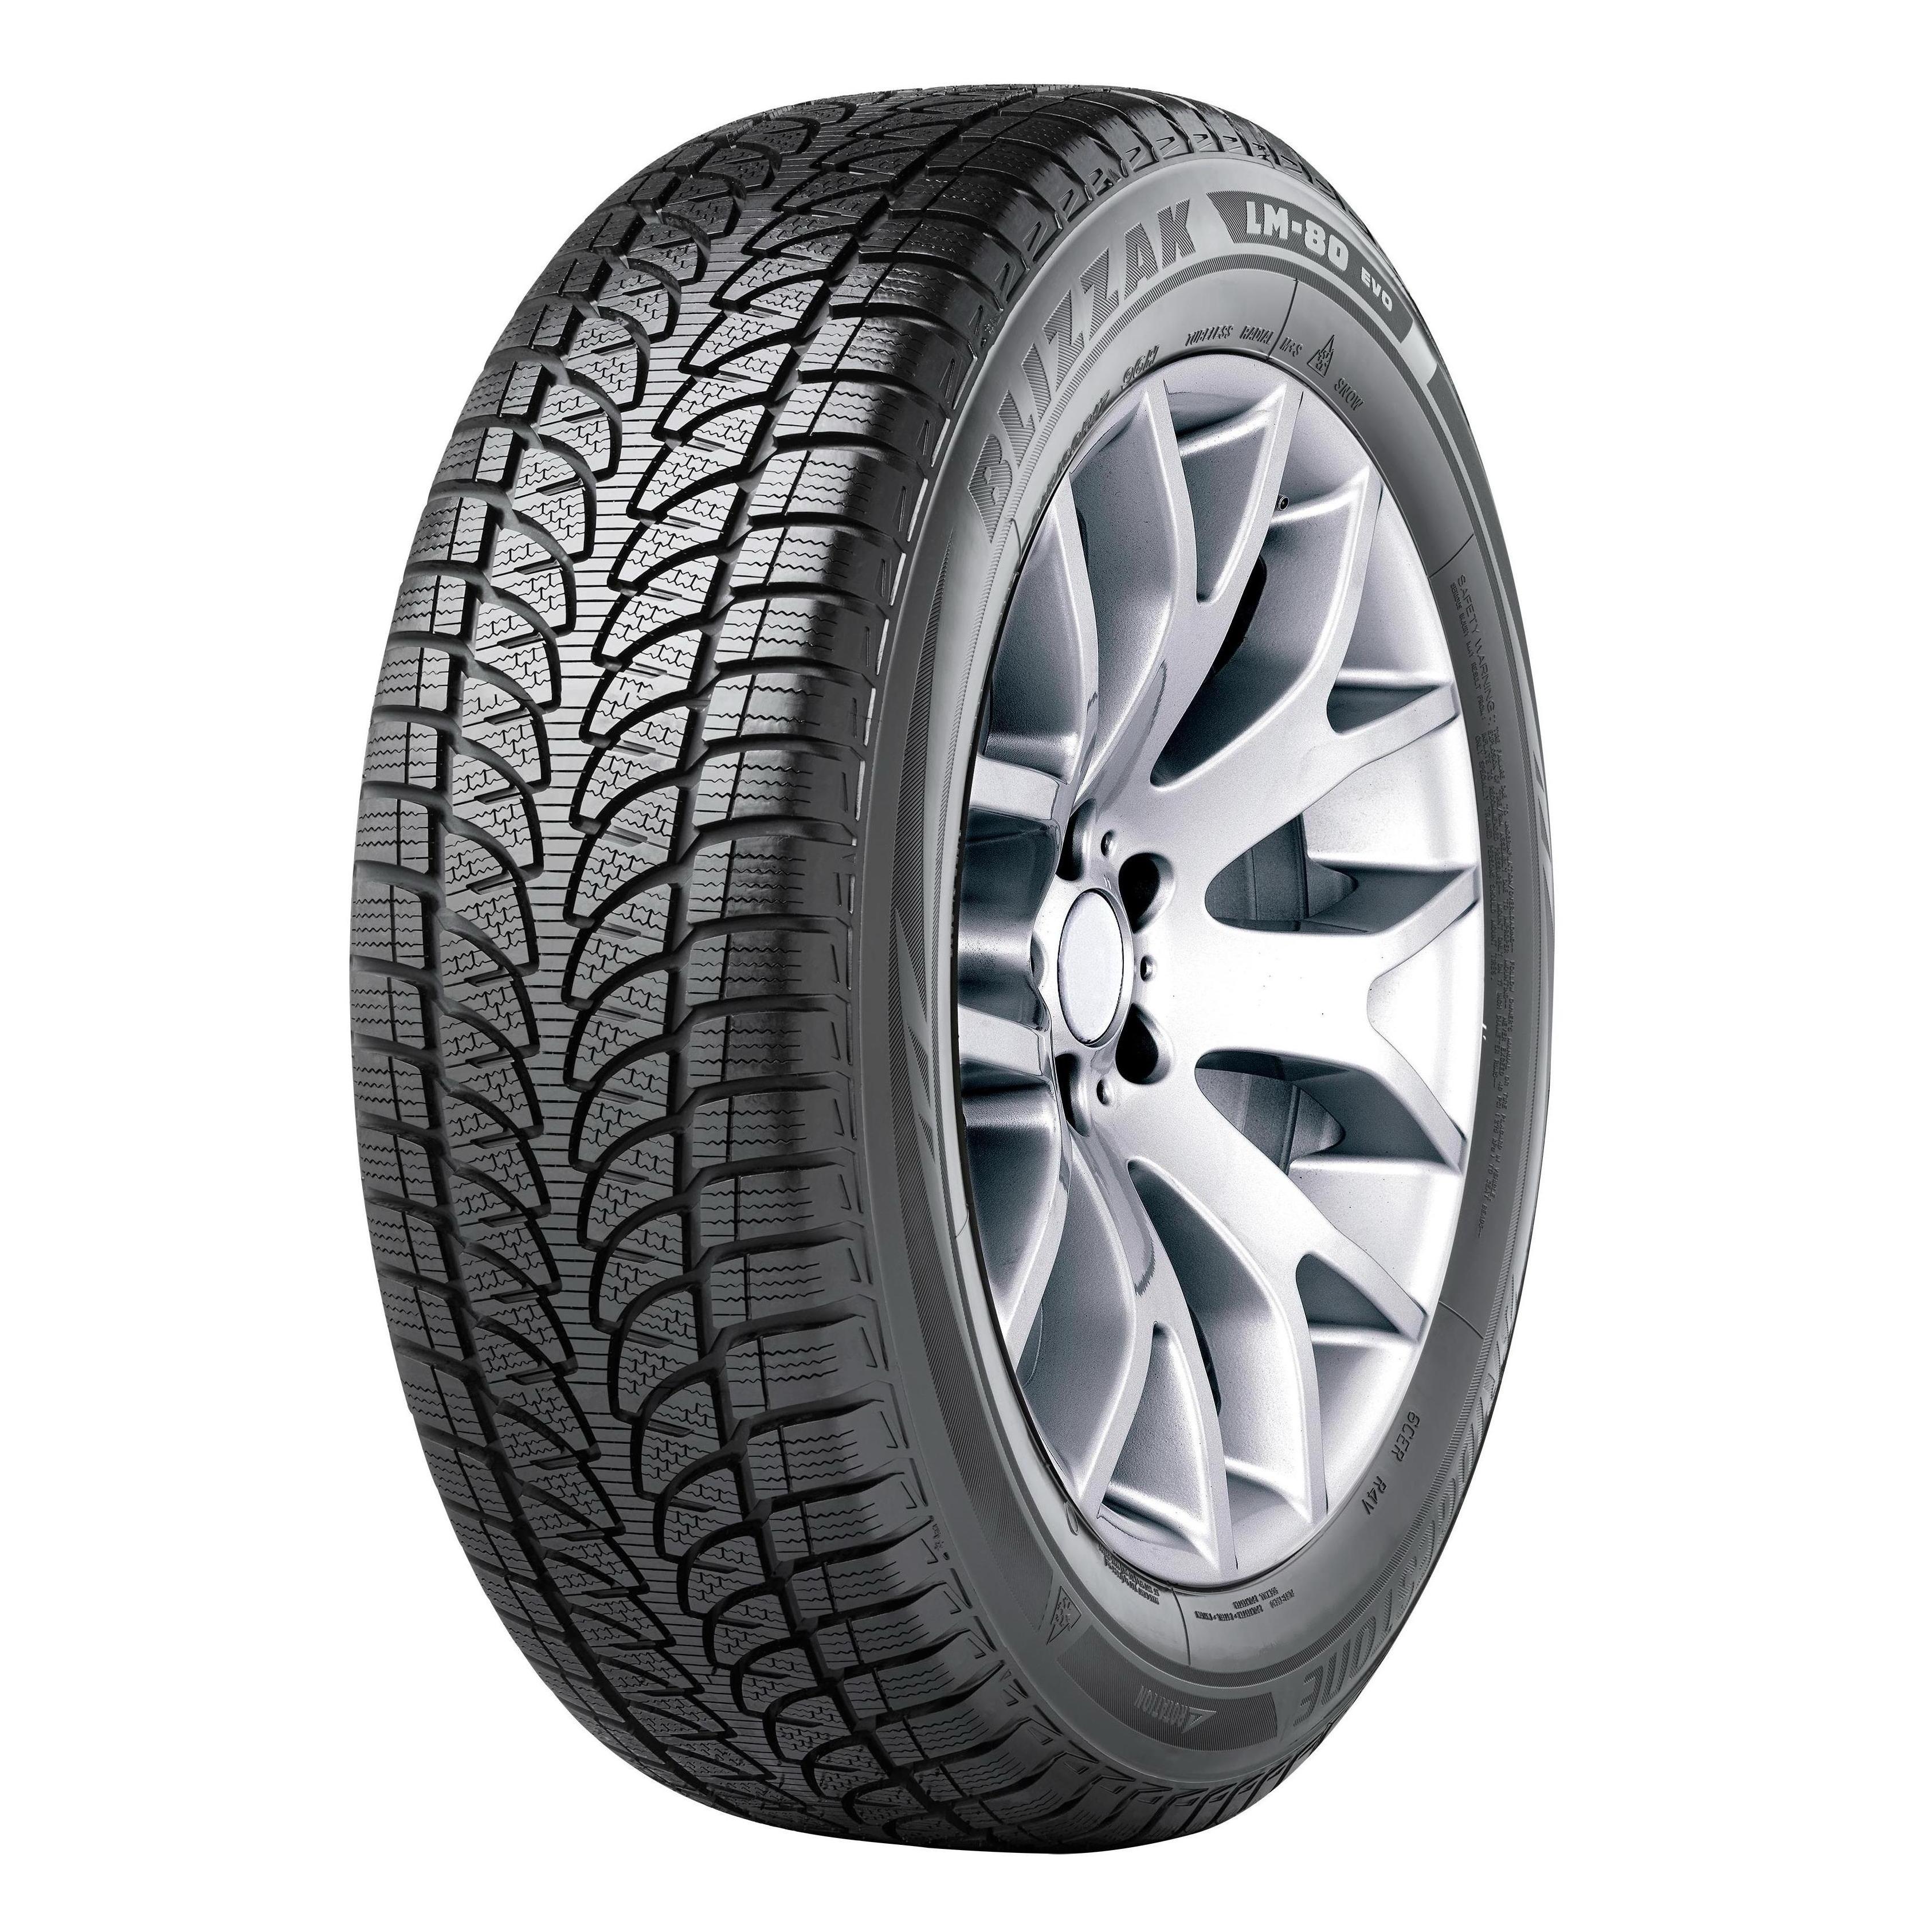 Bridgestone Blizzak LM 80 Evo   265/60R18